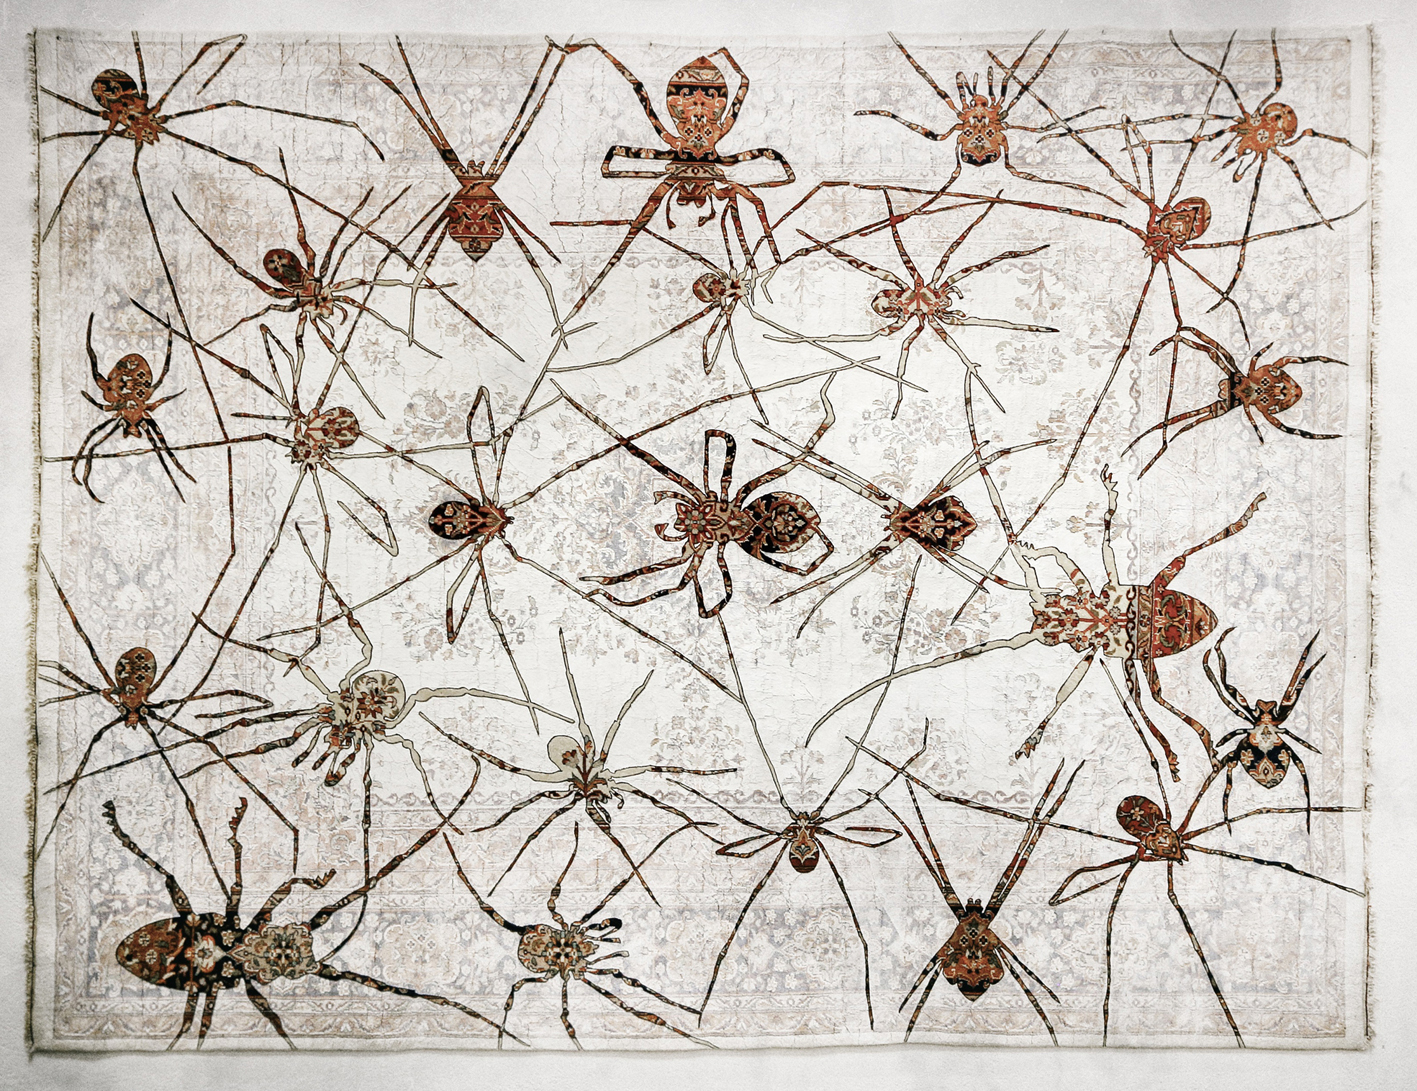 web222-noemi_kiss_340x240cm_spiders-tapestry-overpainted-oriental-rug-marion_friedmann_gallery_produktion_KISSTHEREICHL_photo_helmut_krbec_prep.jpg